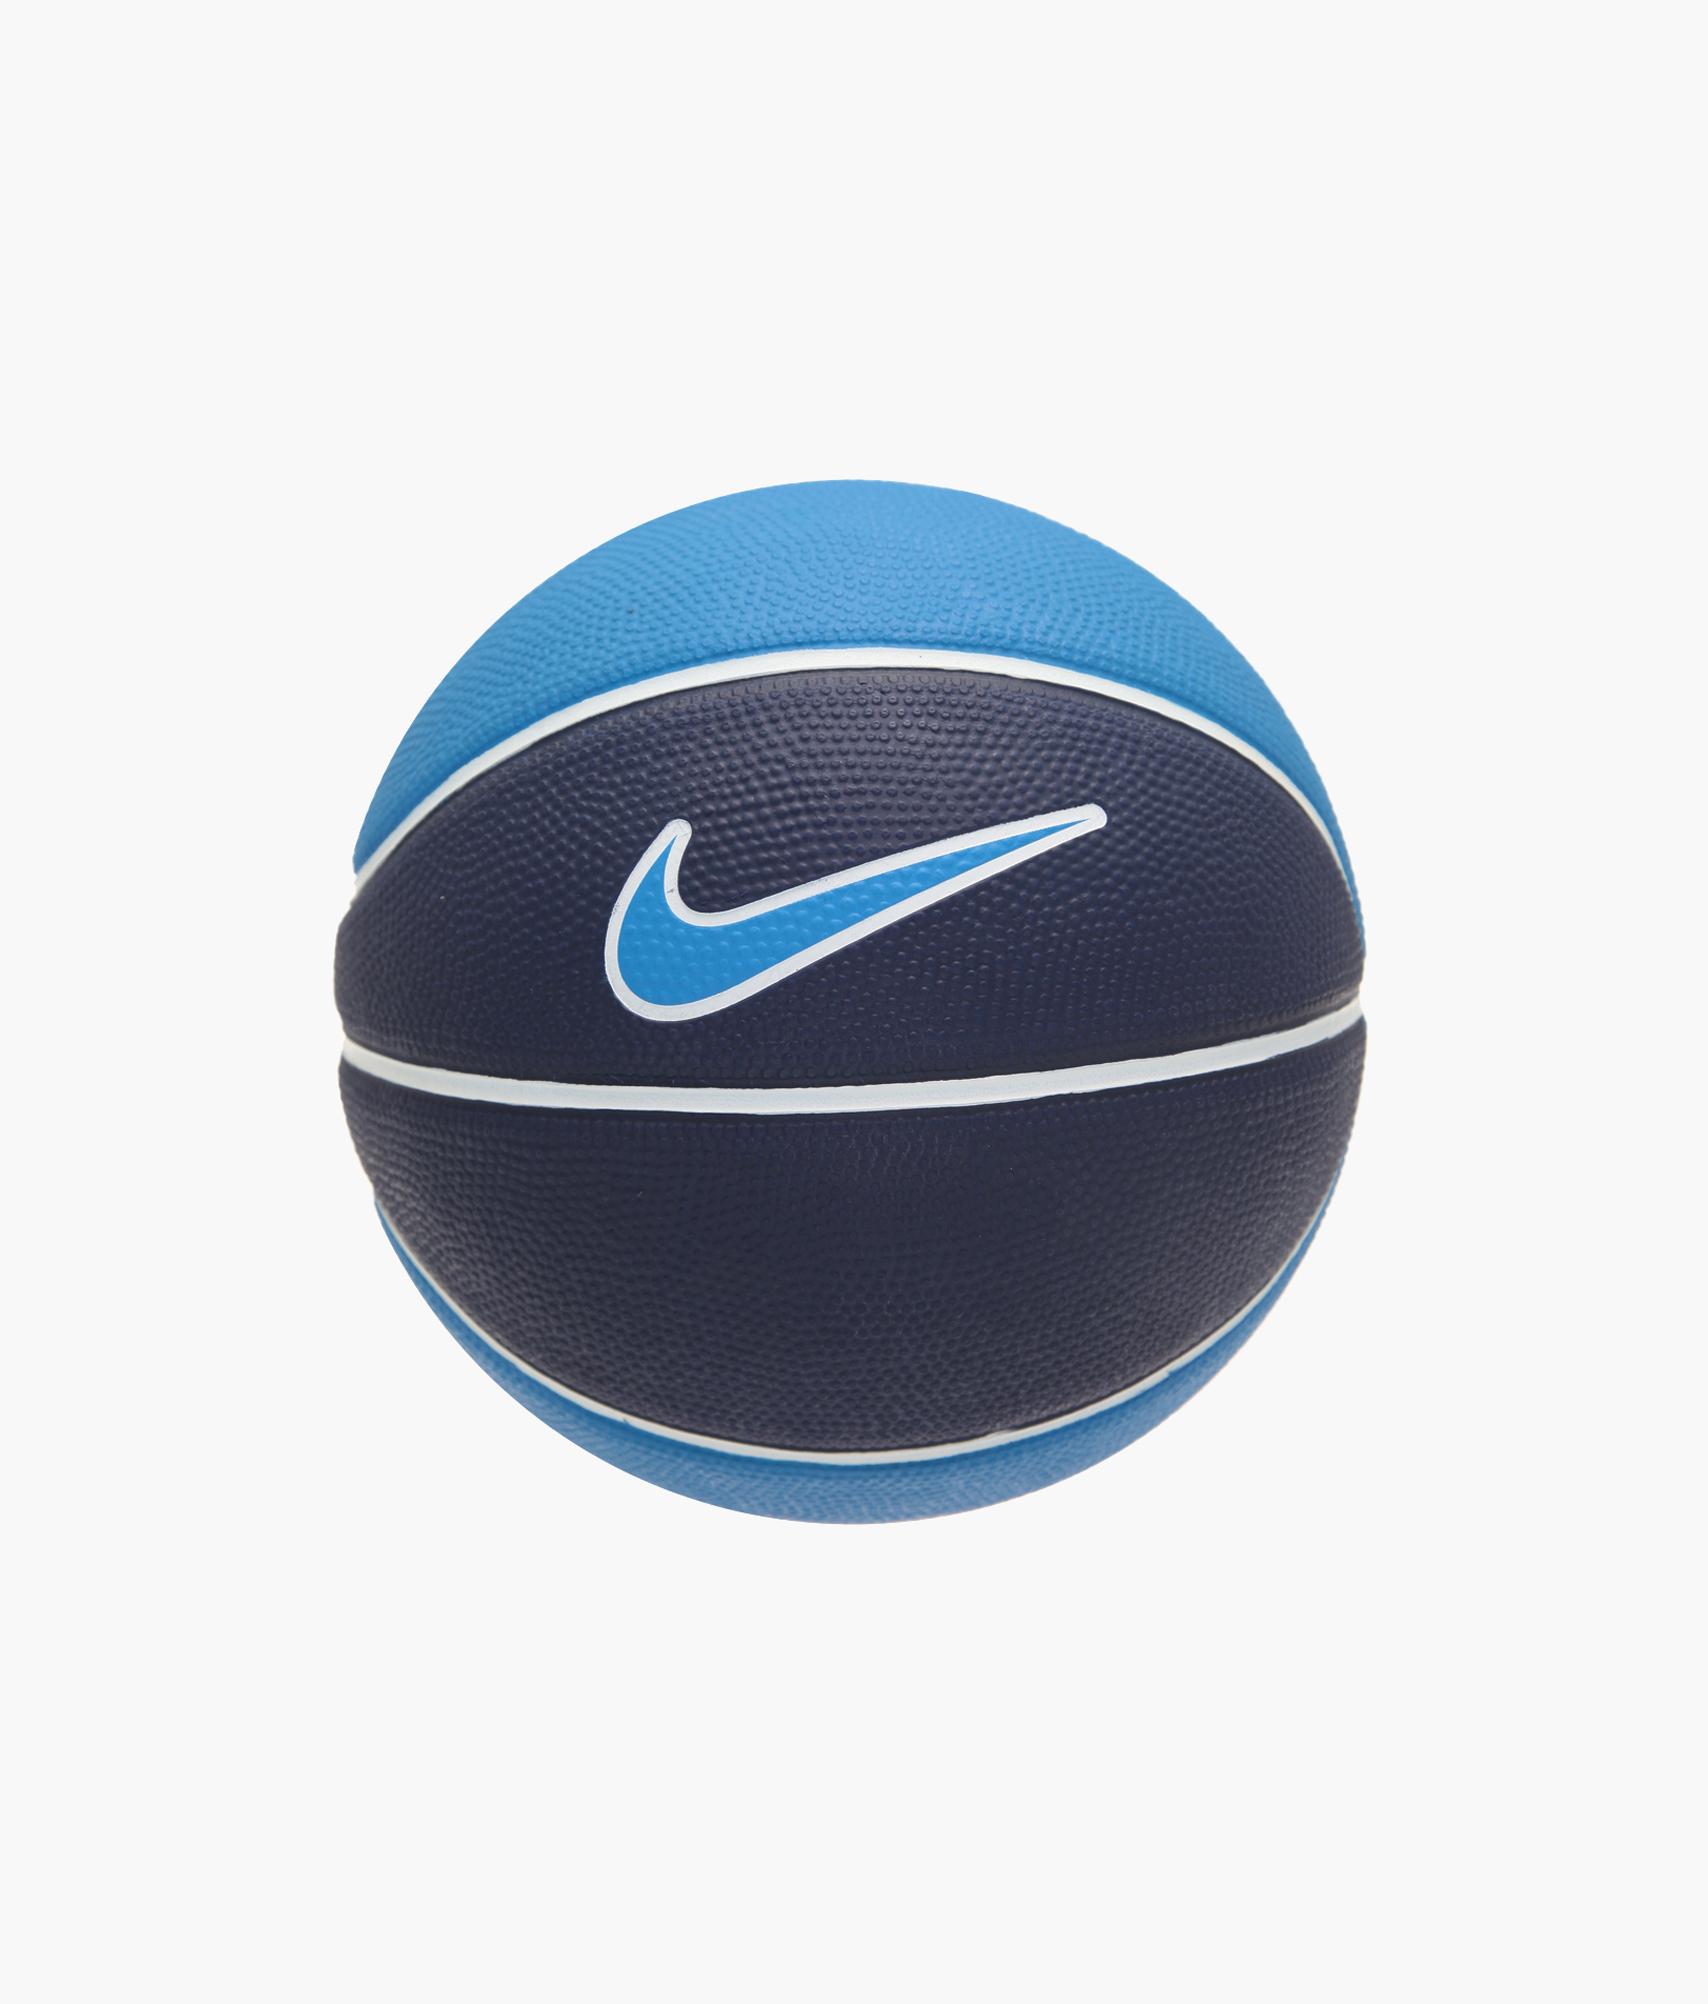 Мяч баскетбольный Nike Nike Цвет-Синий баскетбольный мяч nike hyper elite 8p 06 n kl 02 855